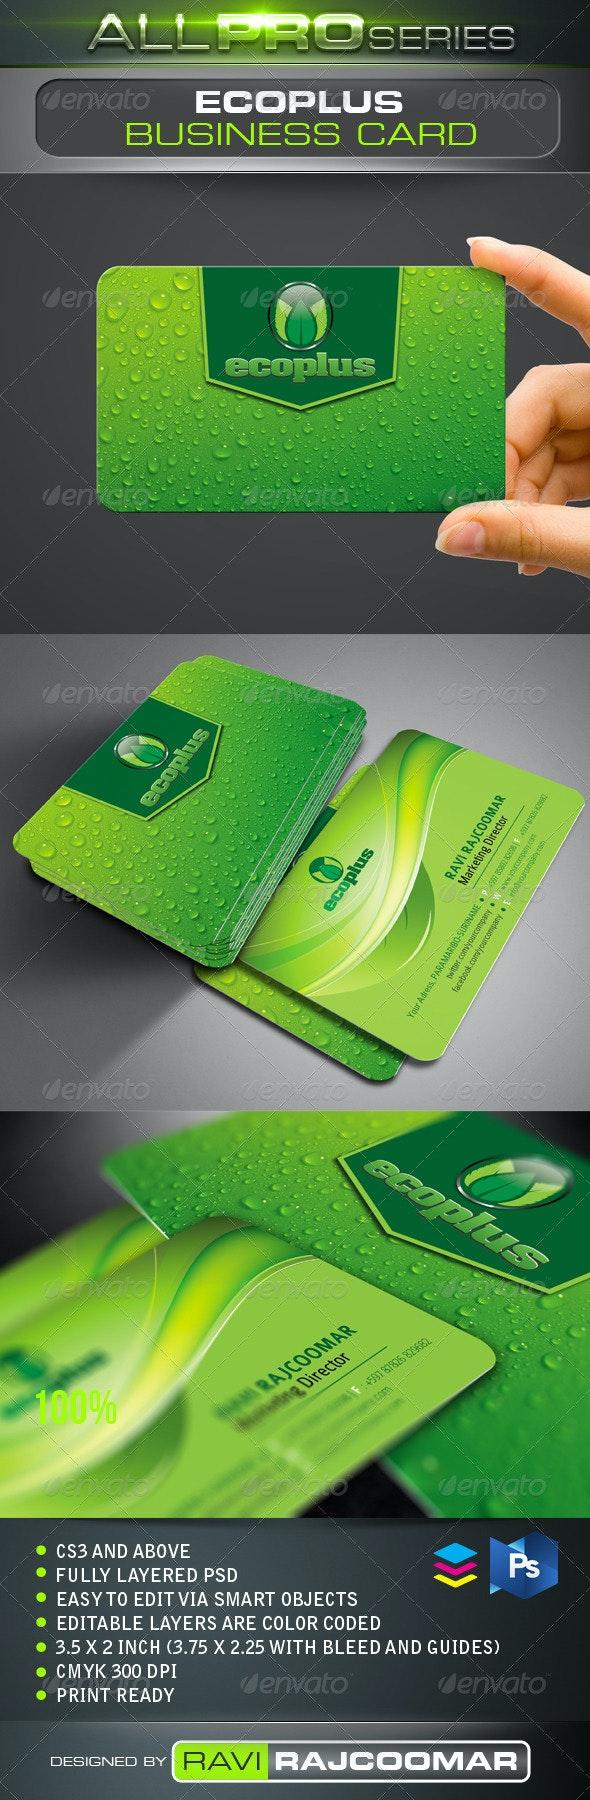 Ecoplus Business Card - Corporate Business Cards